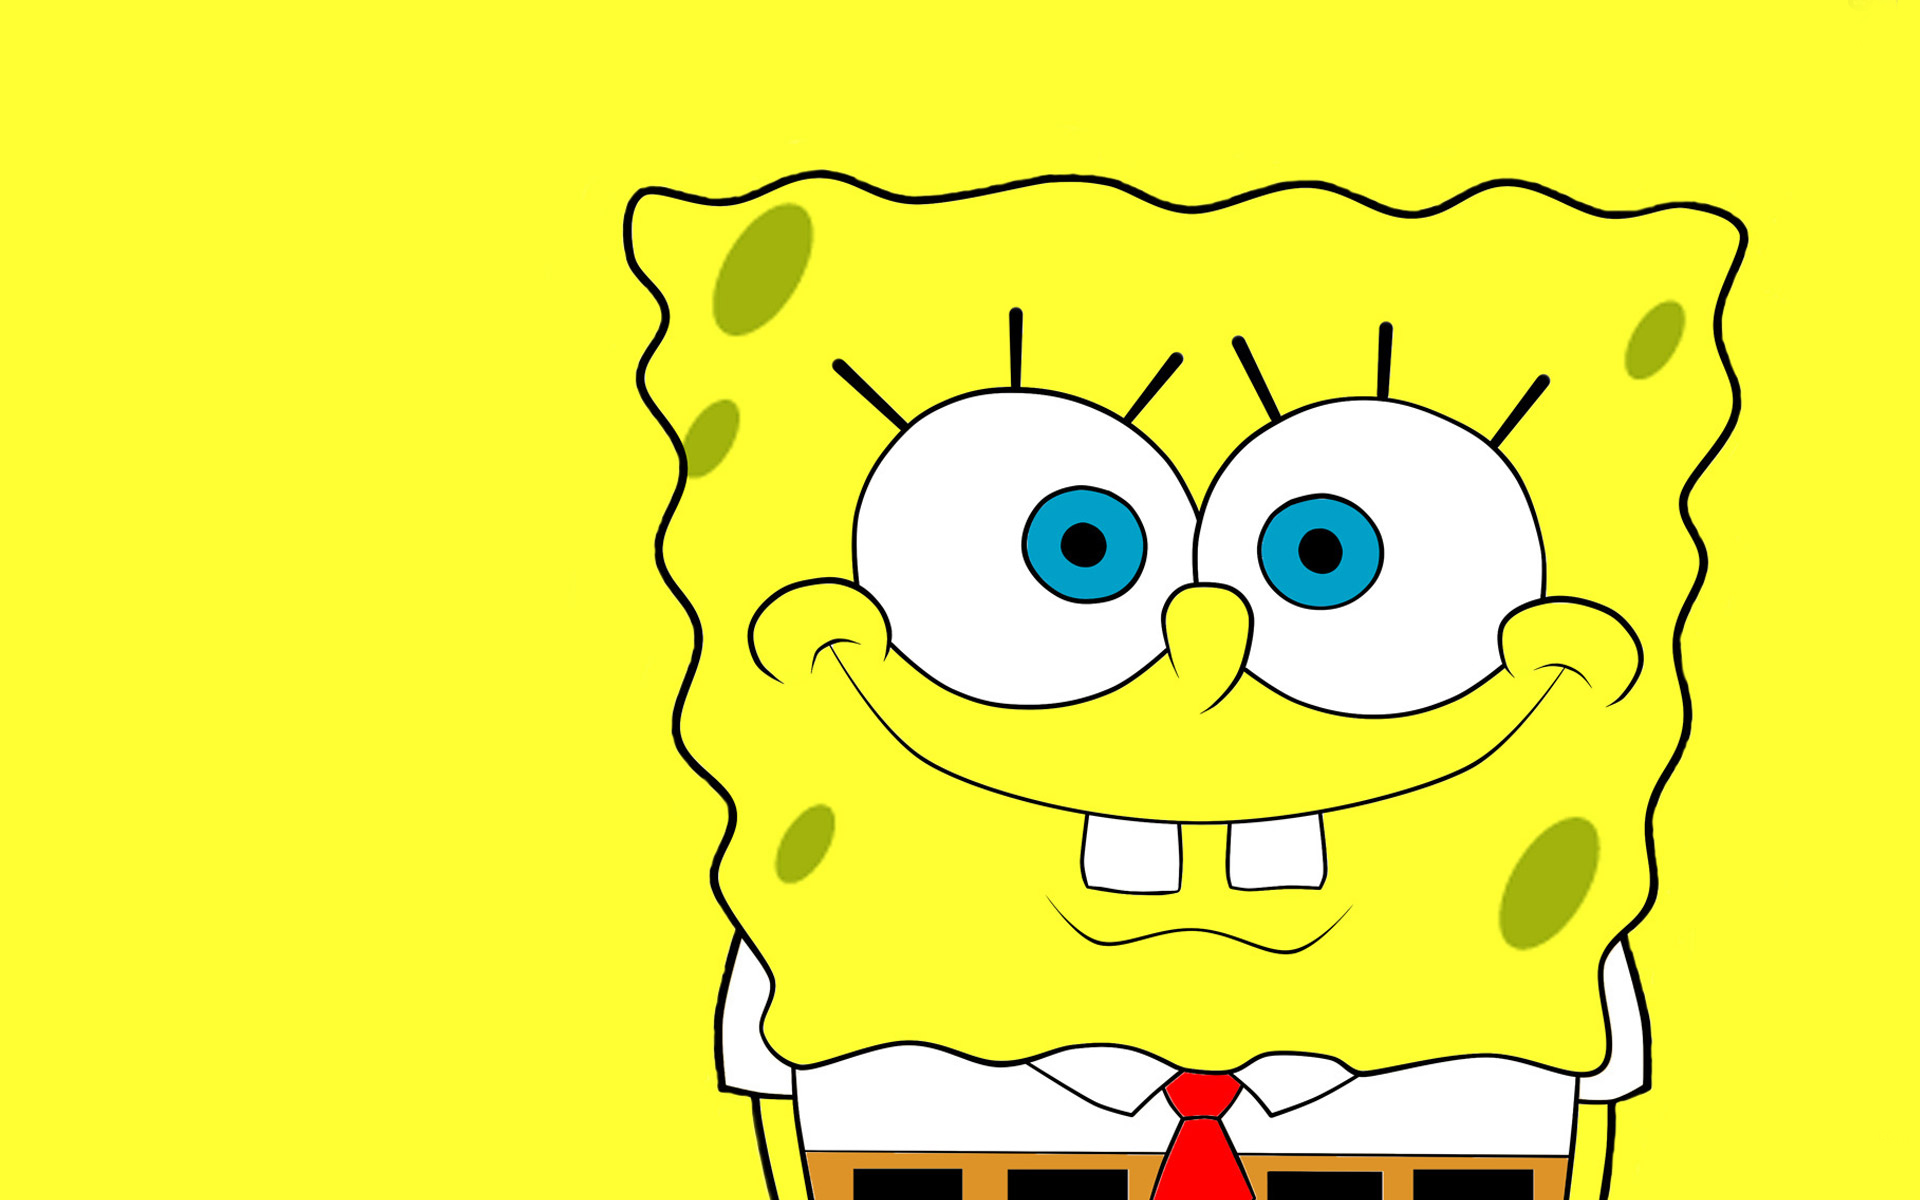 Cute Spongebob Wallpaper Sf Wallpaper